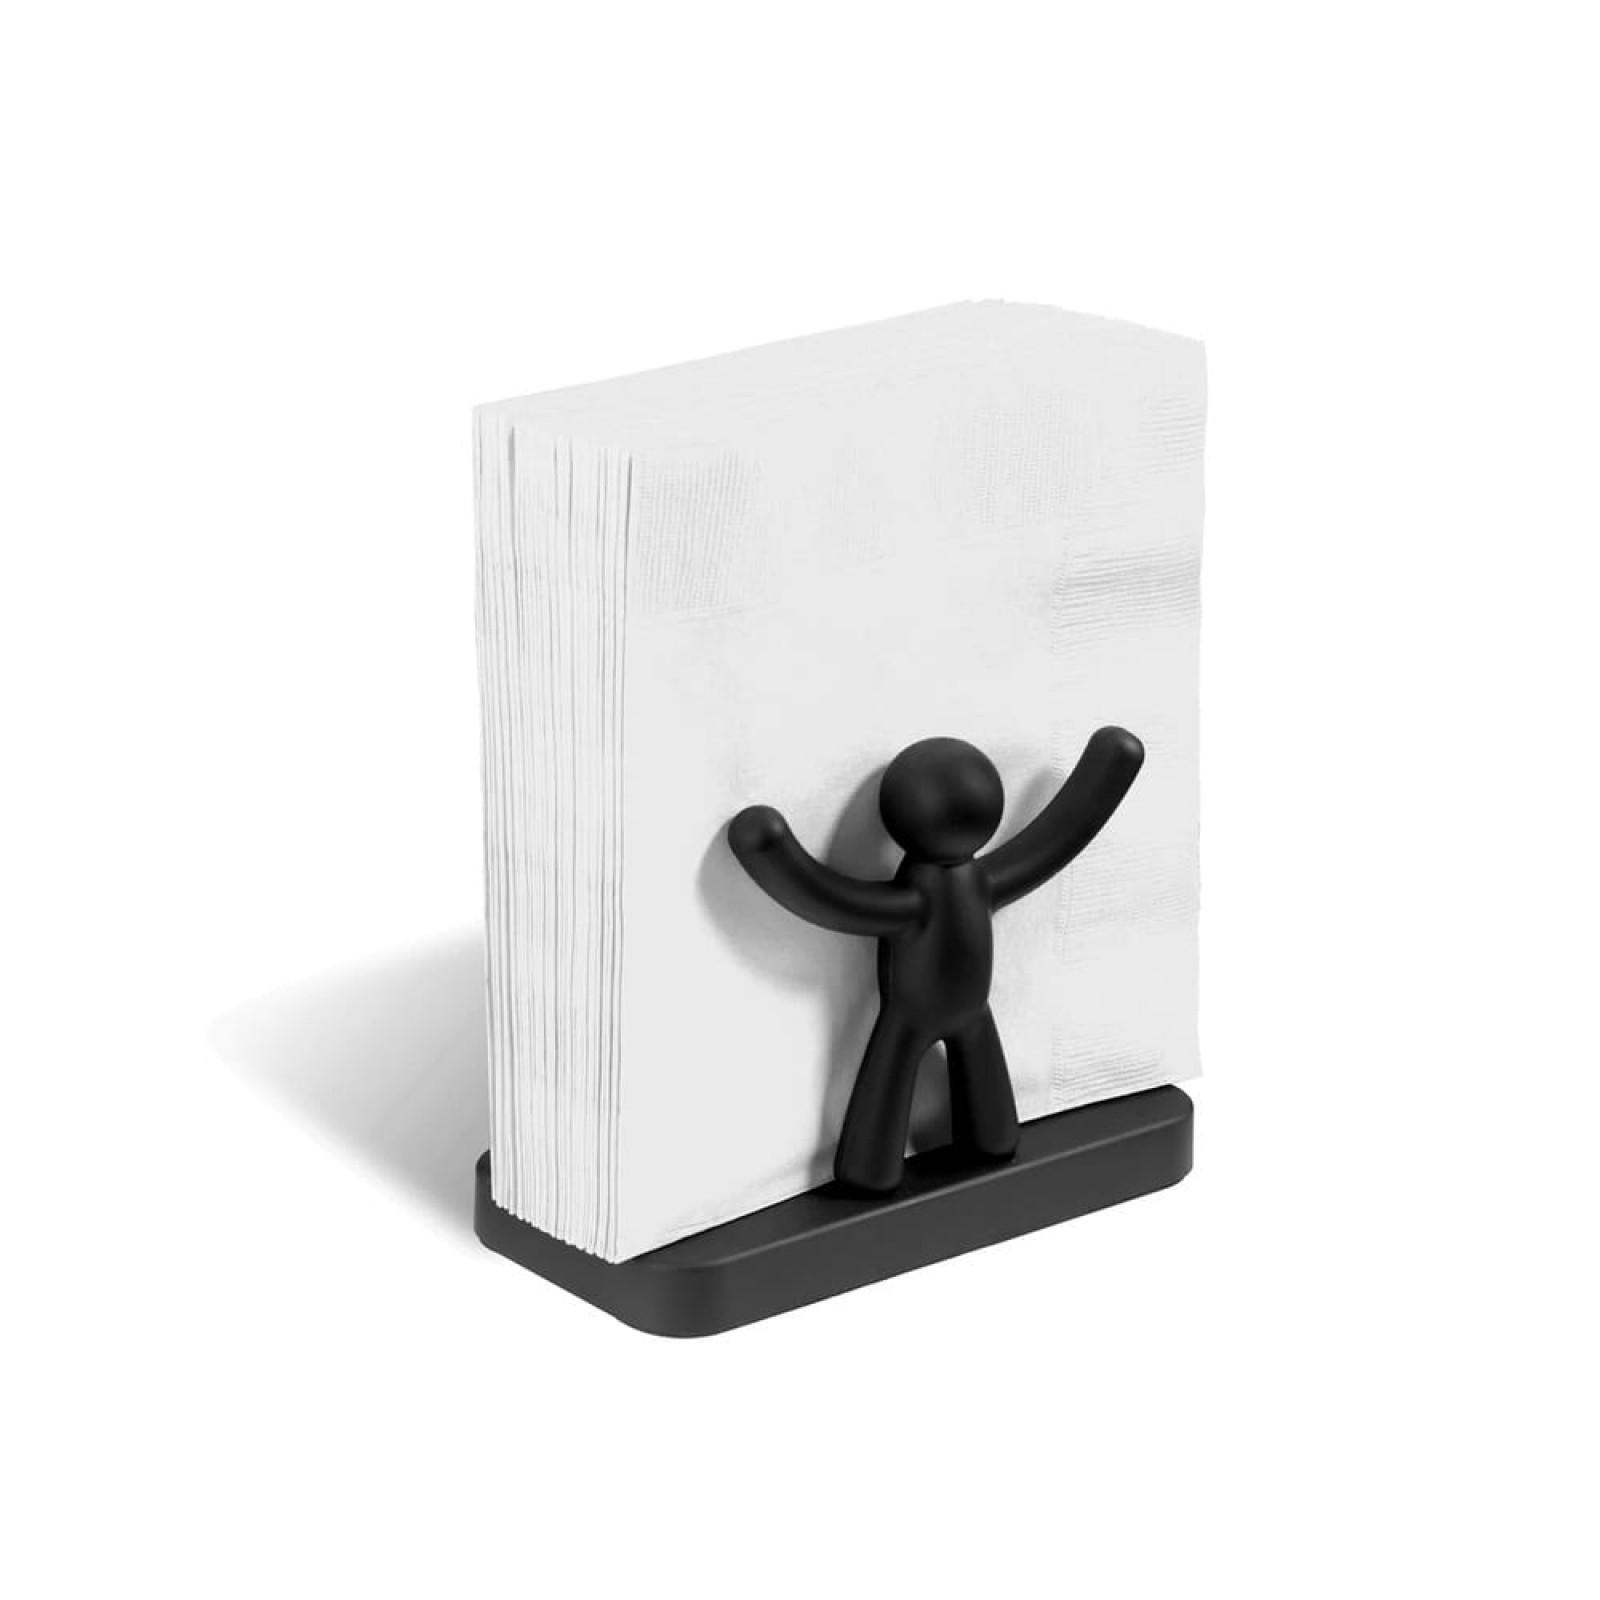 Buddy Napkin Holder (Black) - Umbra